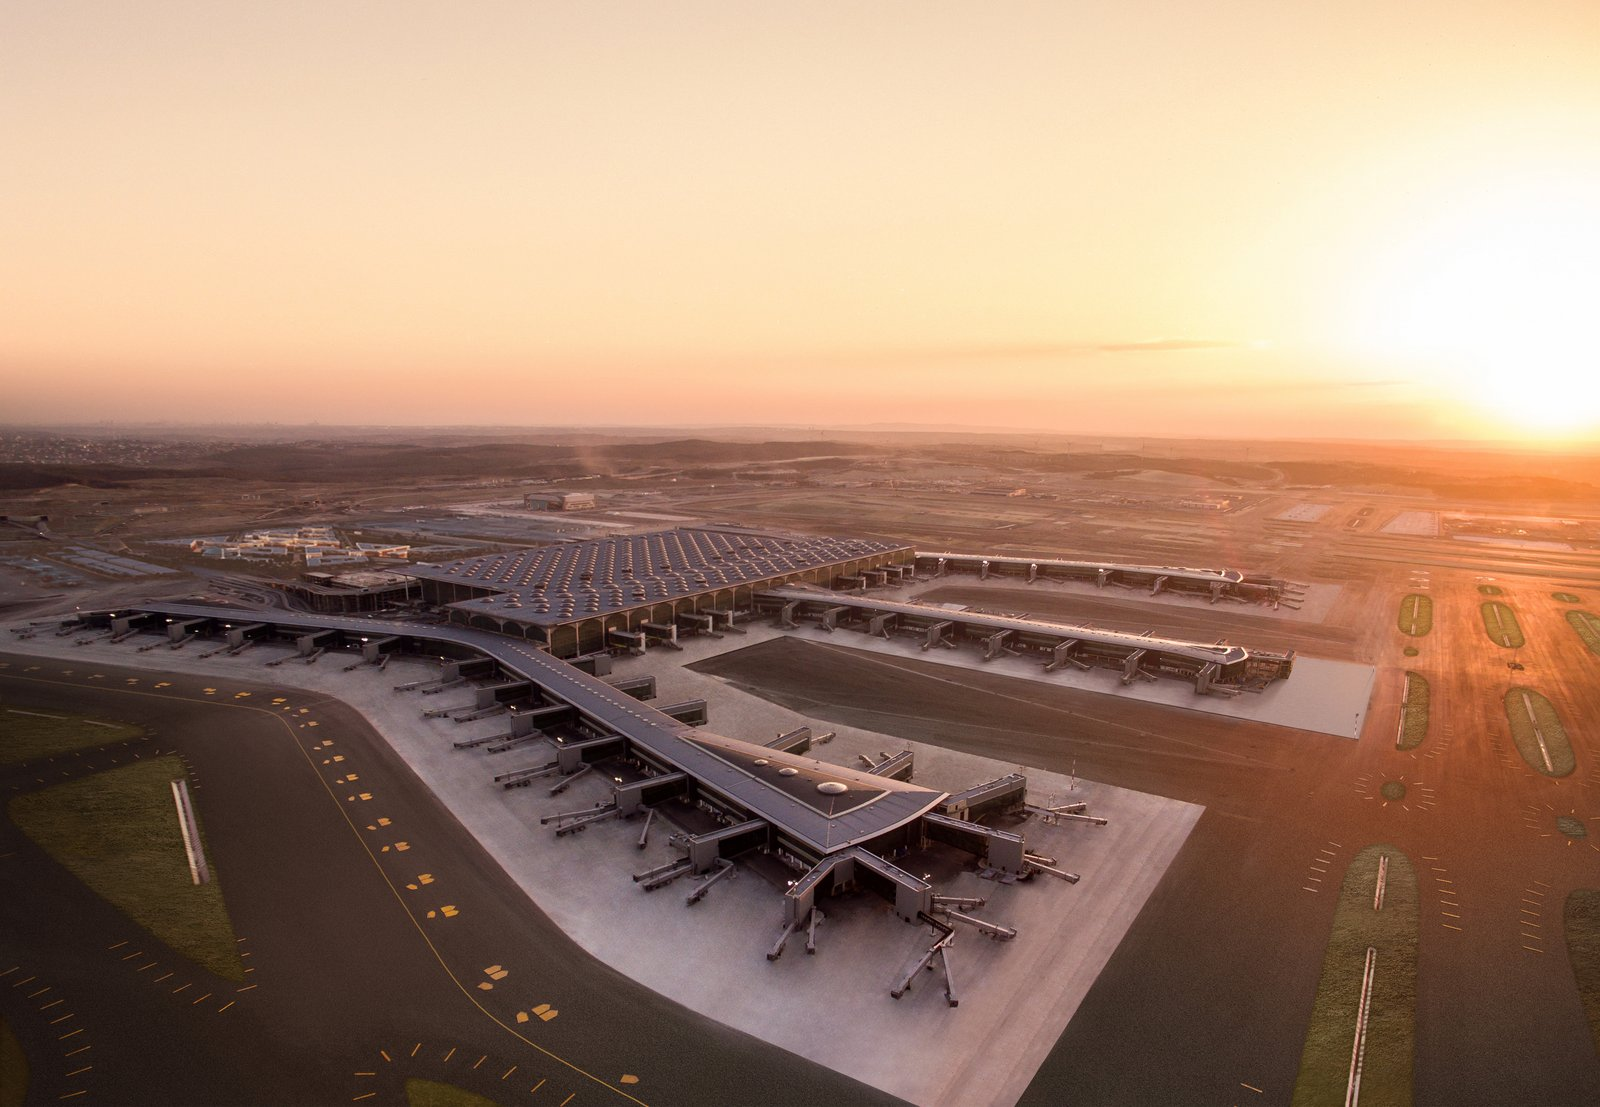 Фото аэропорта в Стамбуле